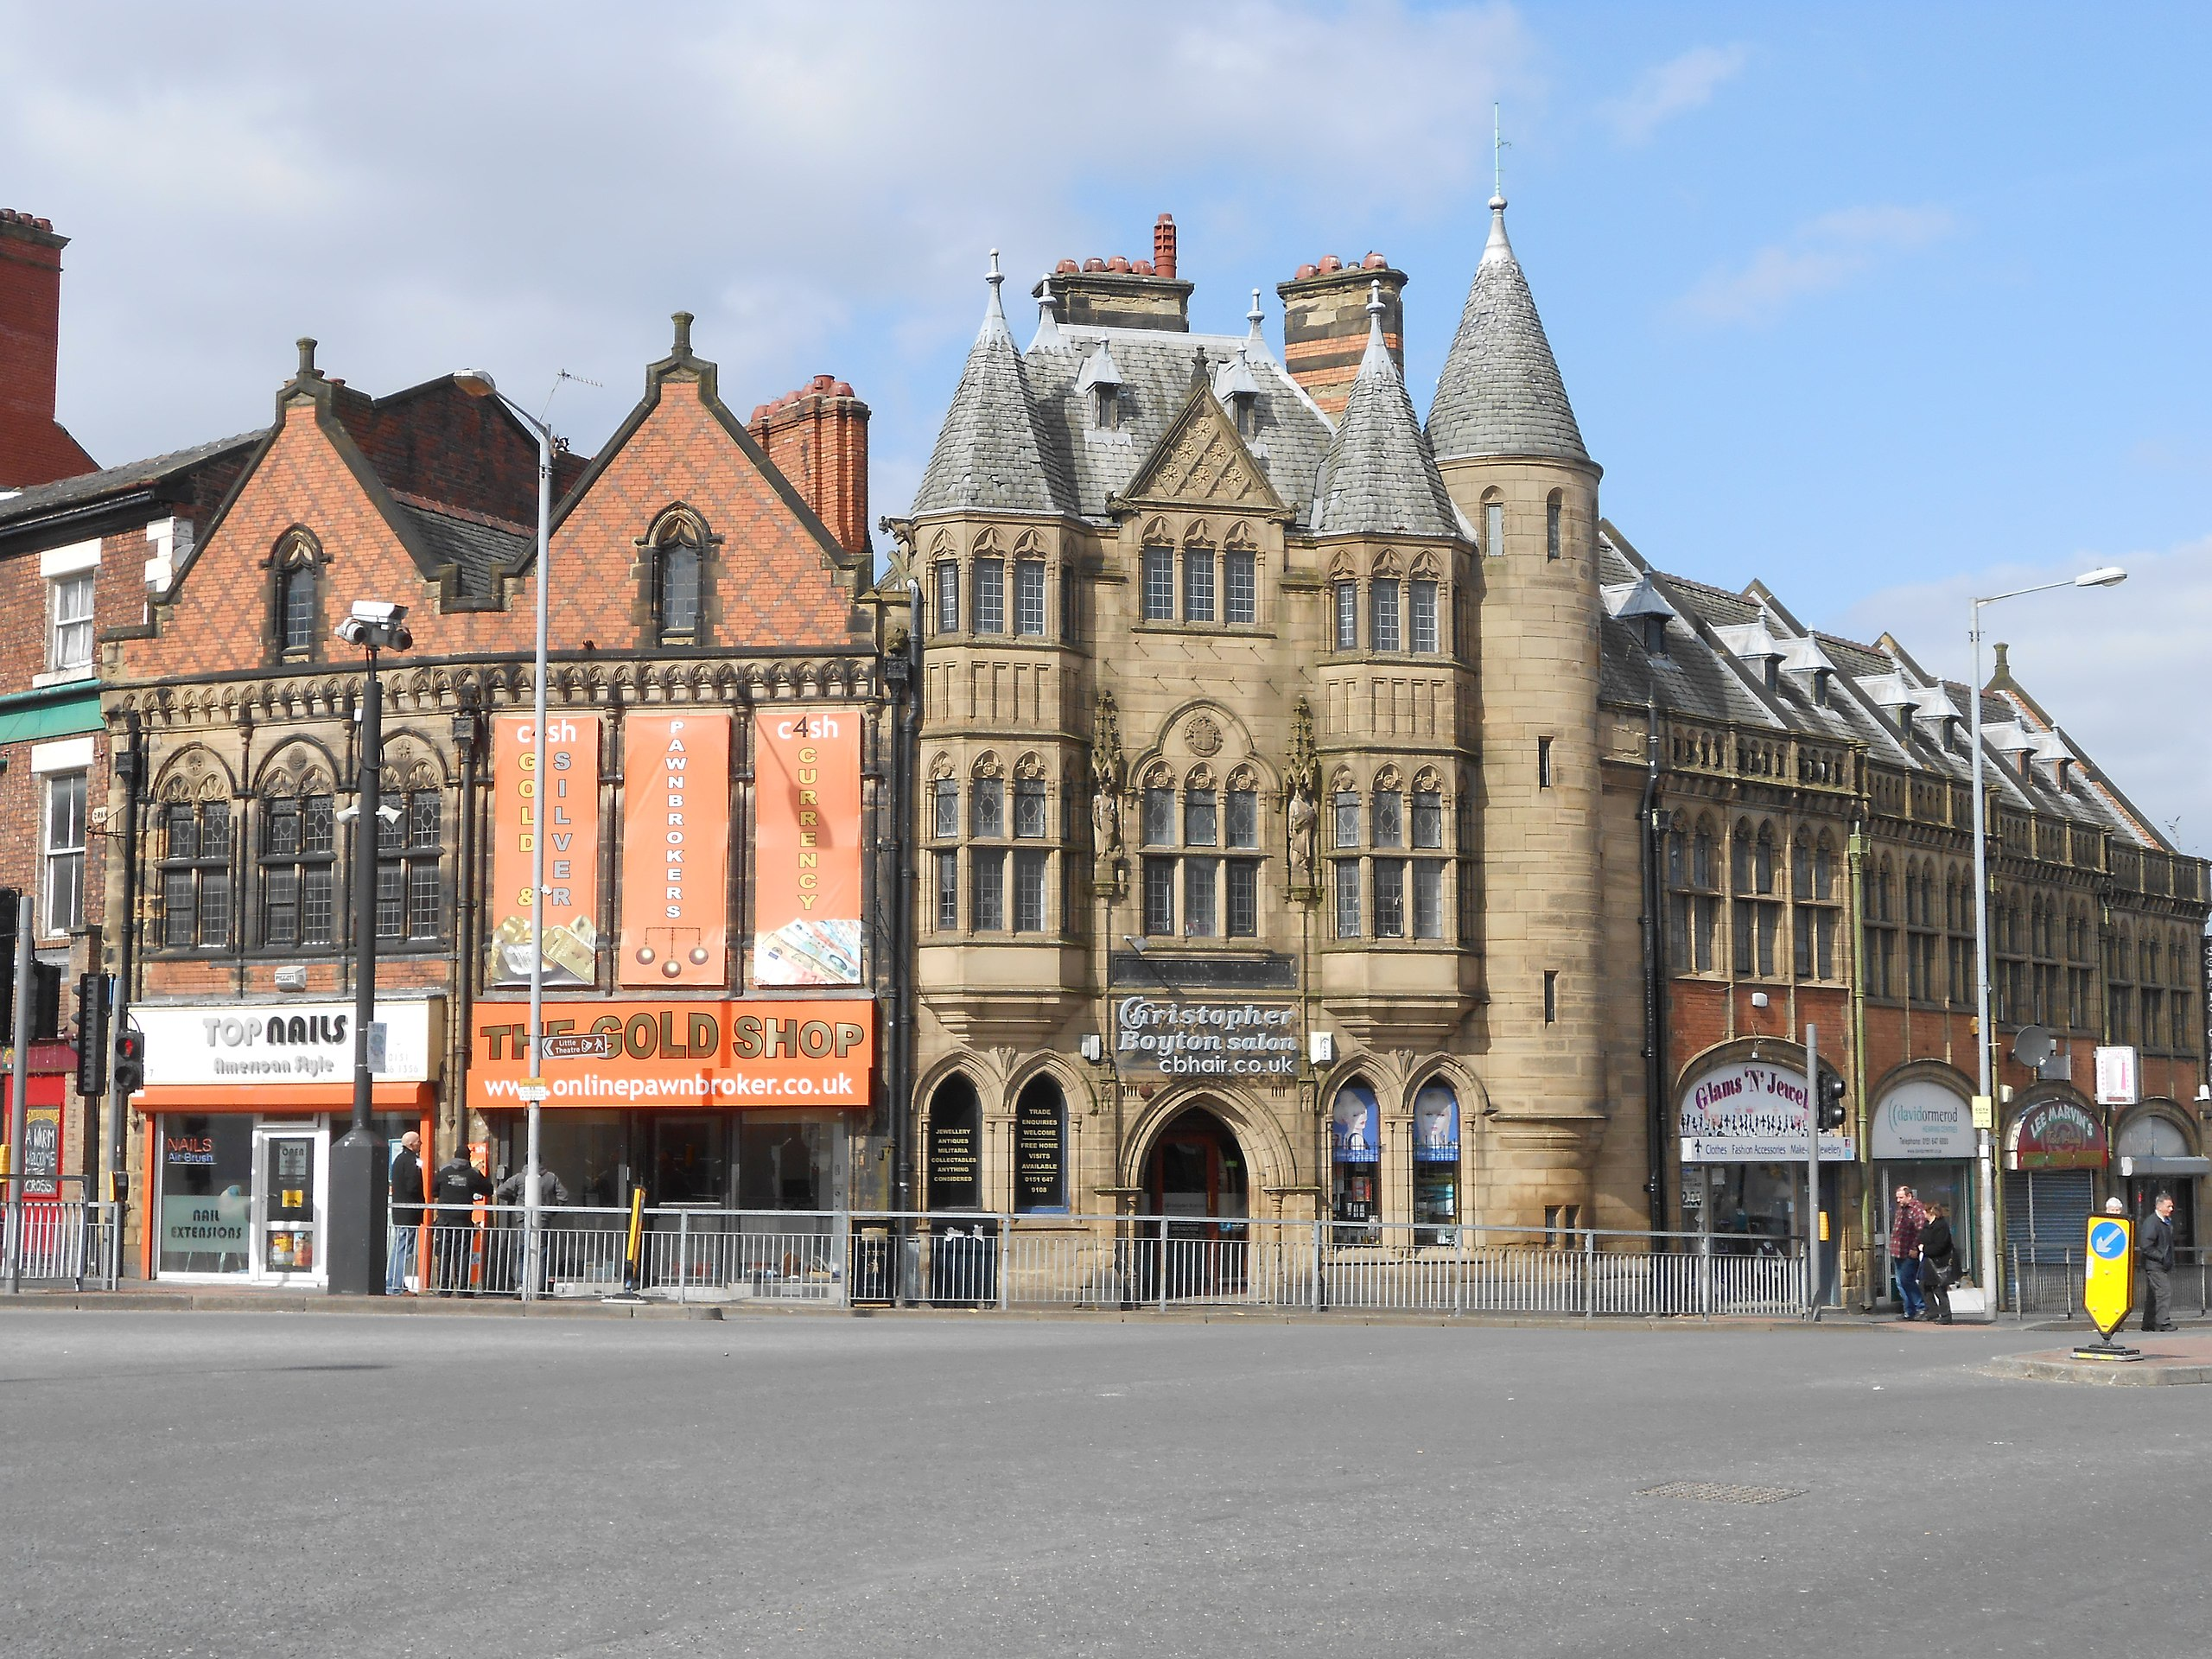 Birkenhead high street